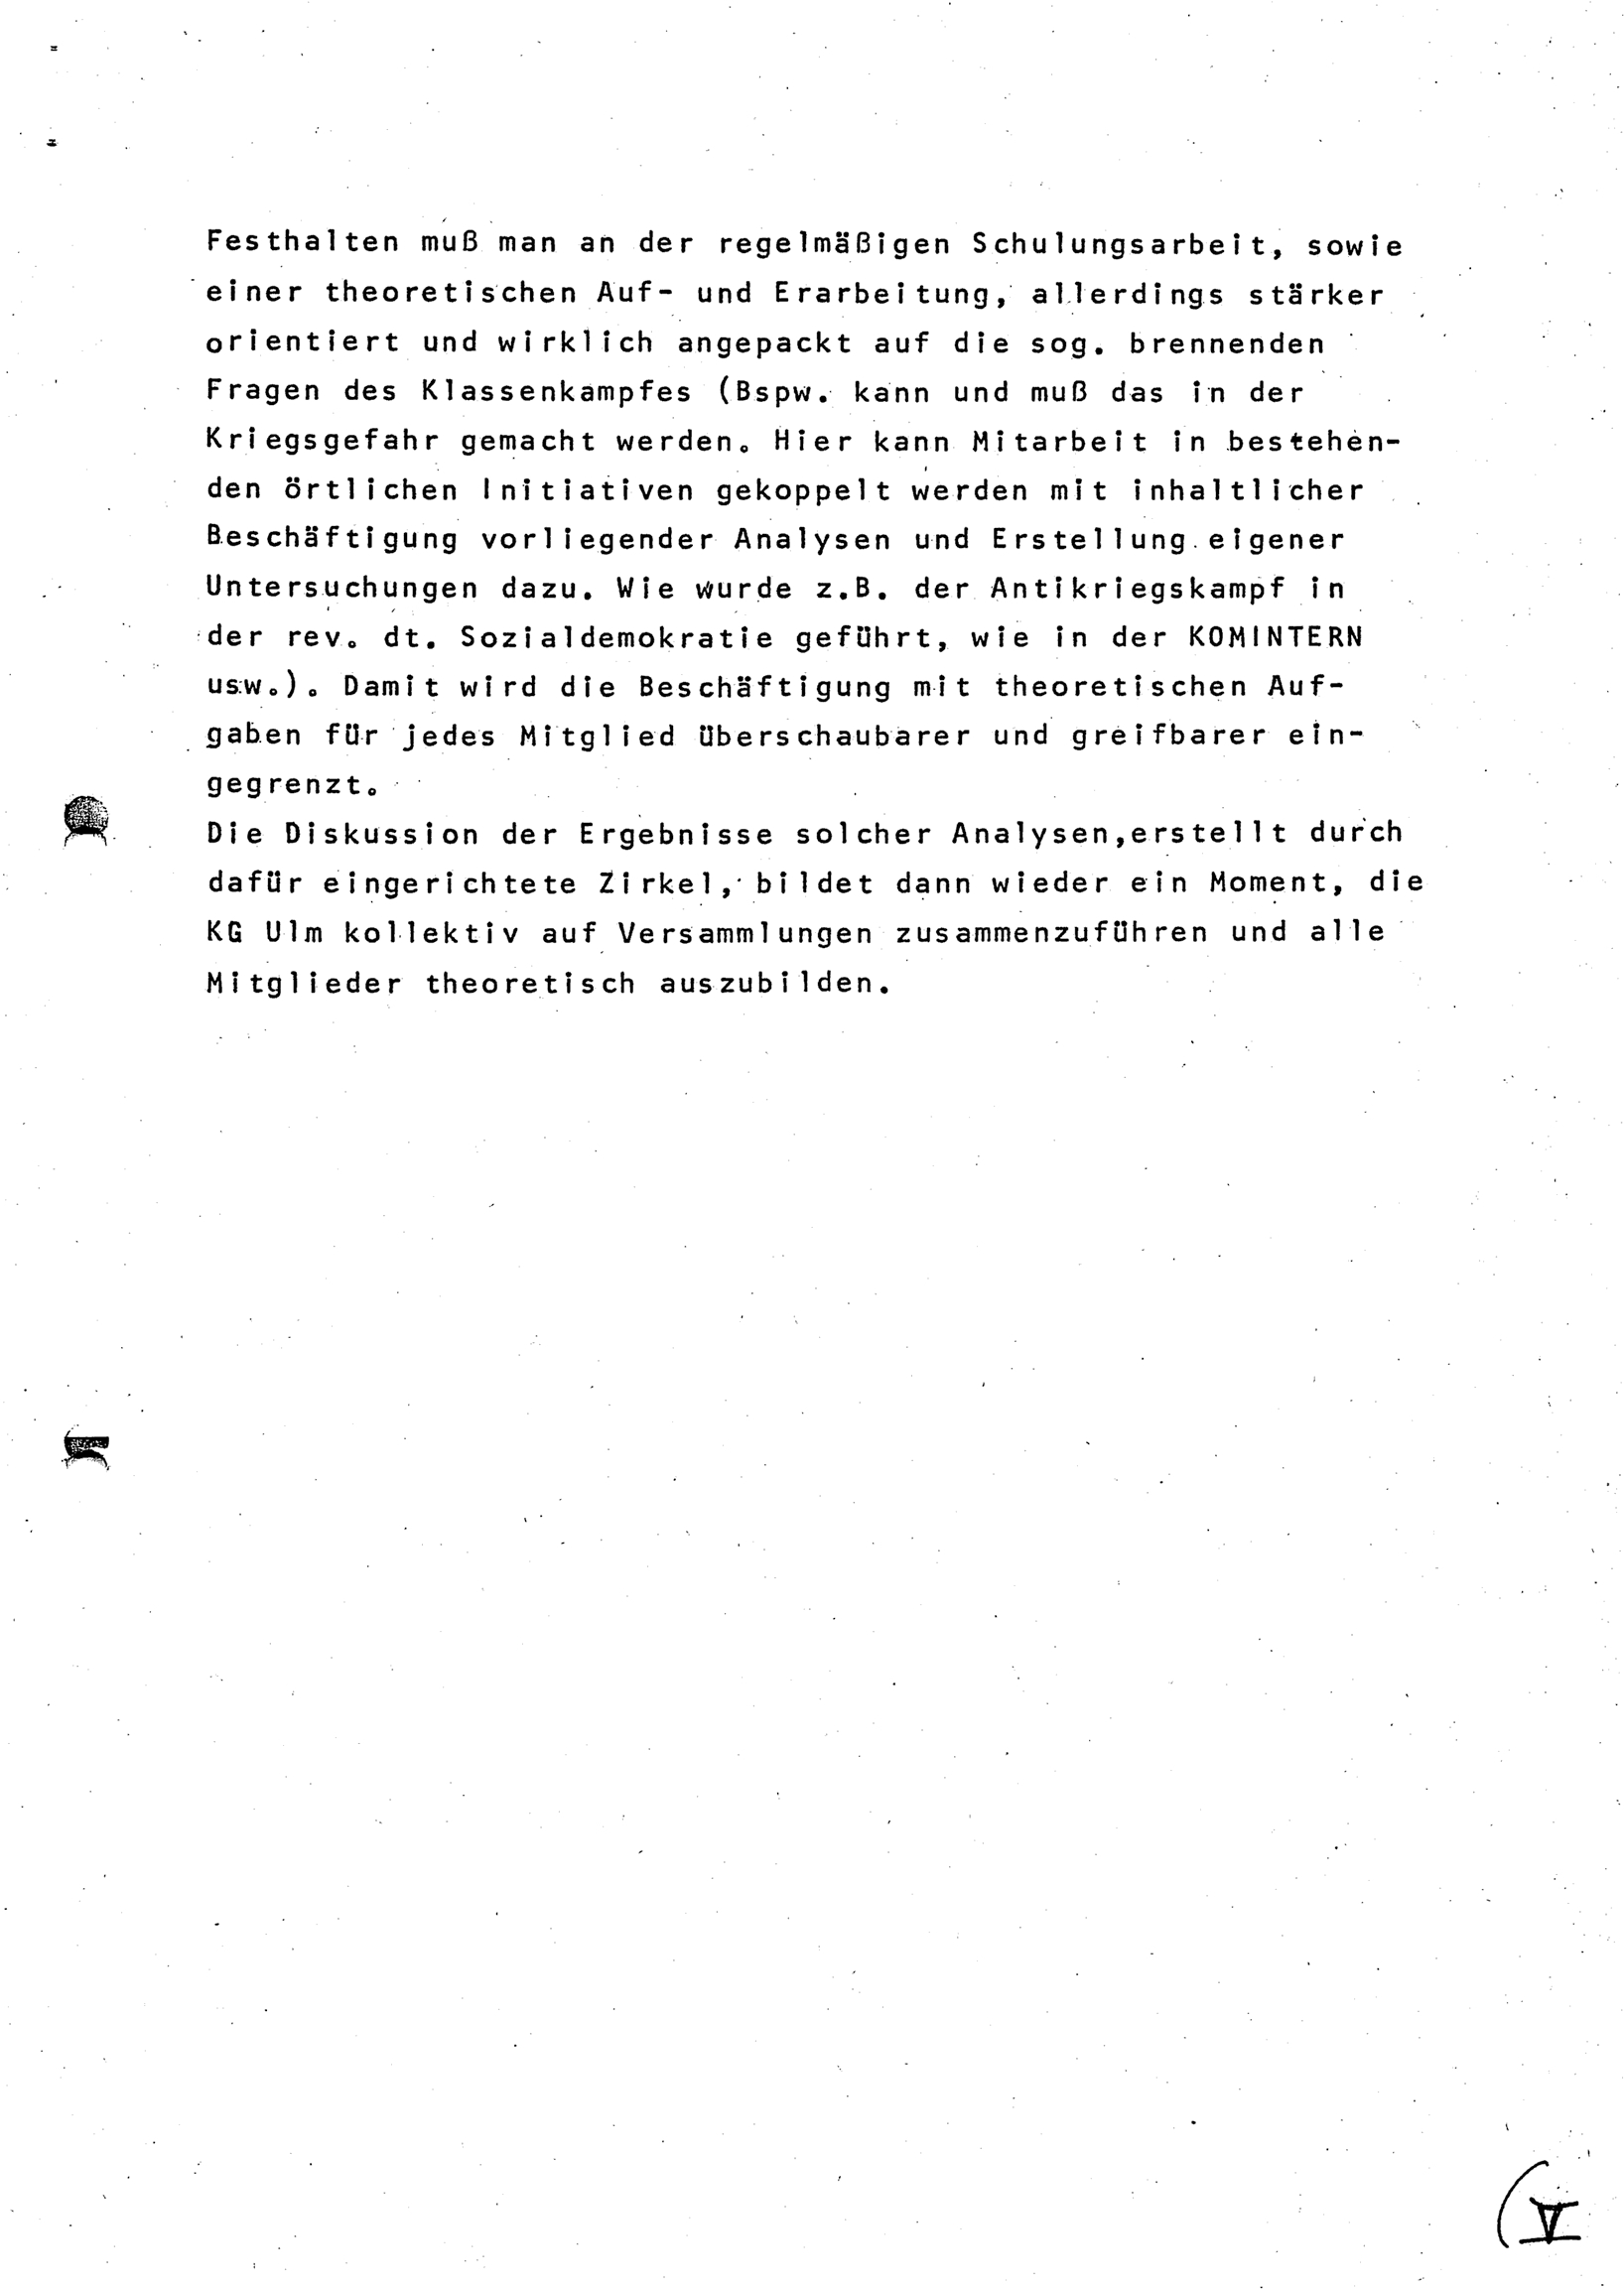 Ulm_KGU_Arbeitsheft_19830425_015_066